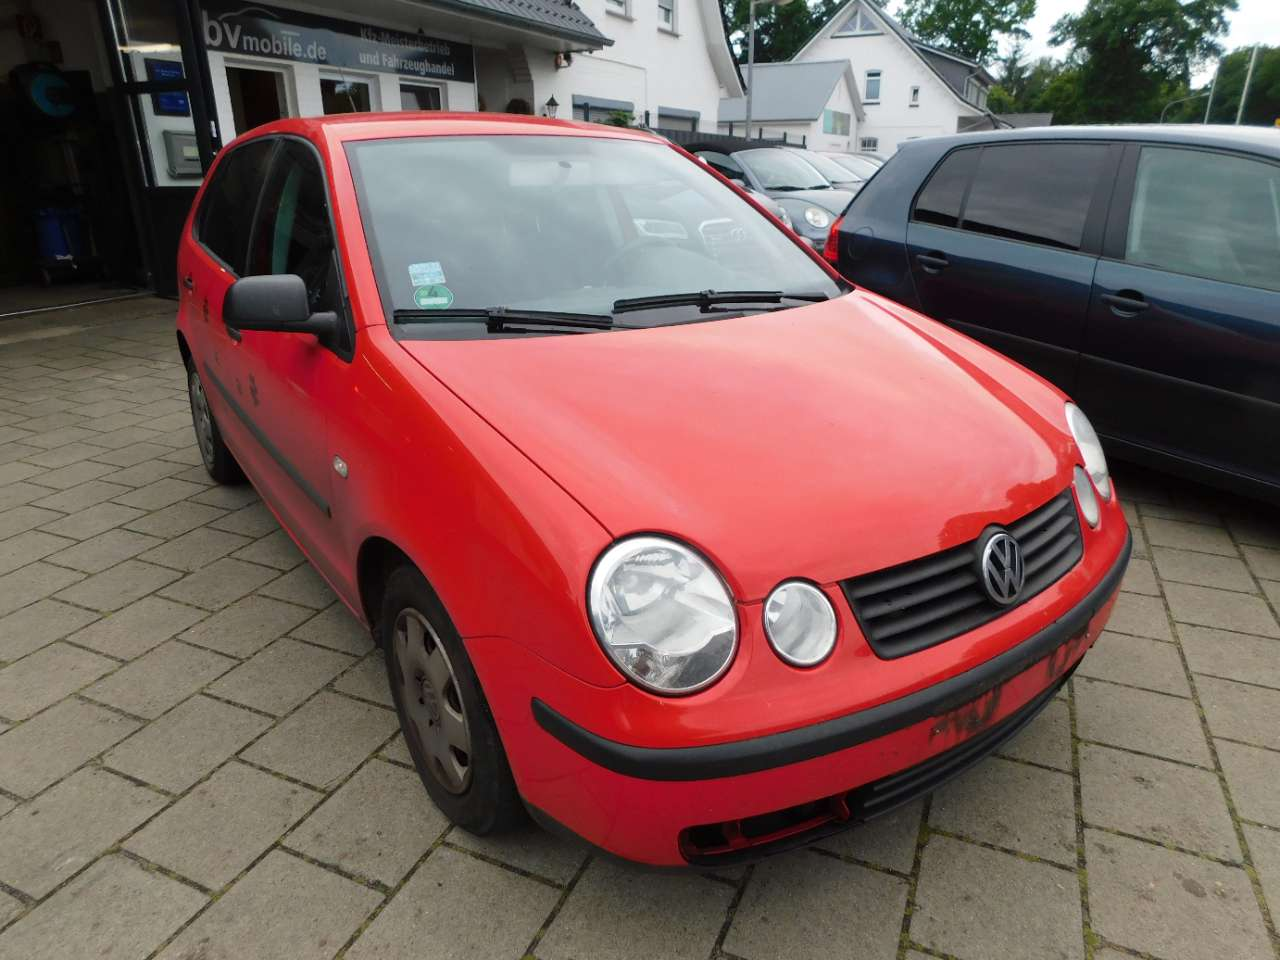 Autos nach Volkswagen Polo Limousine 1.4 TDI